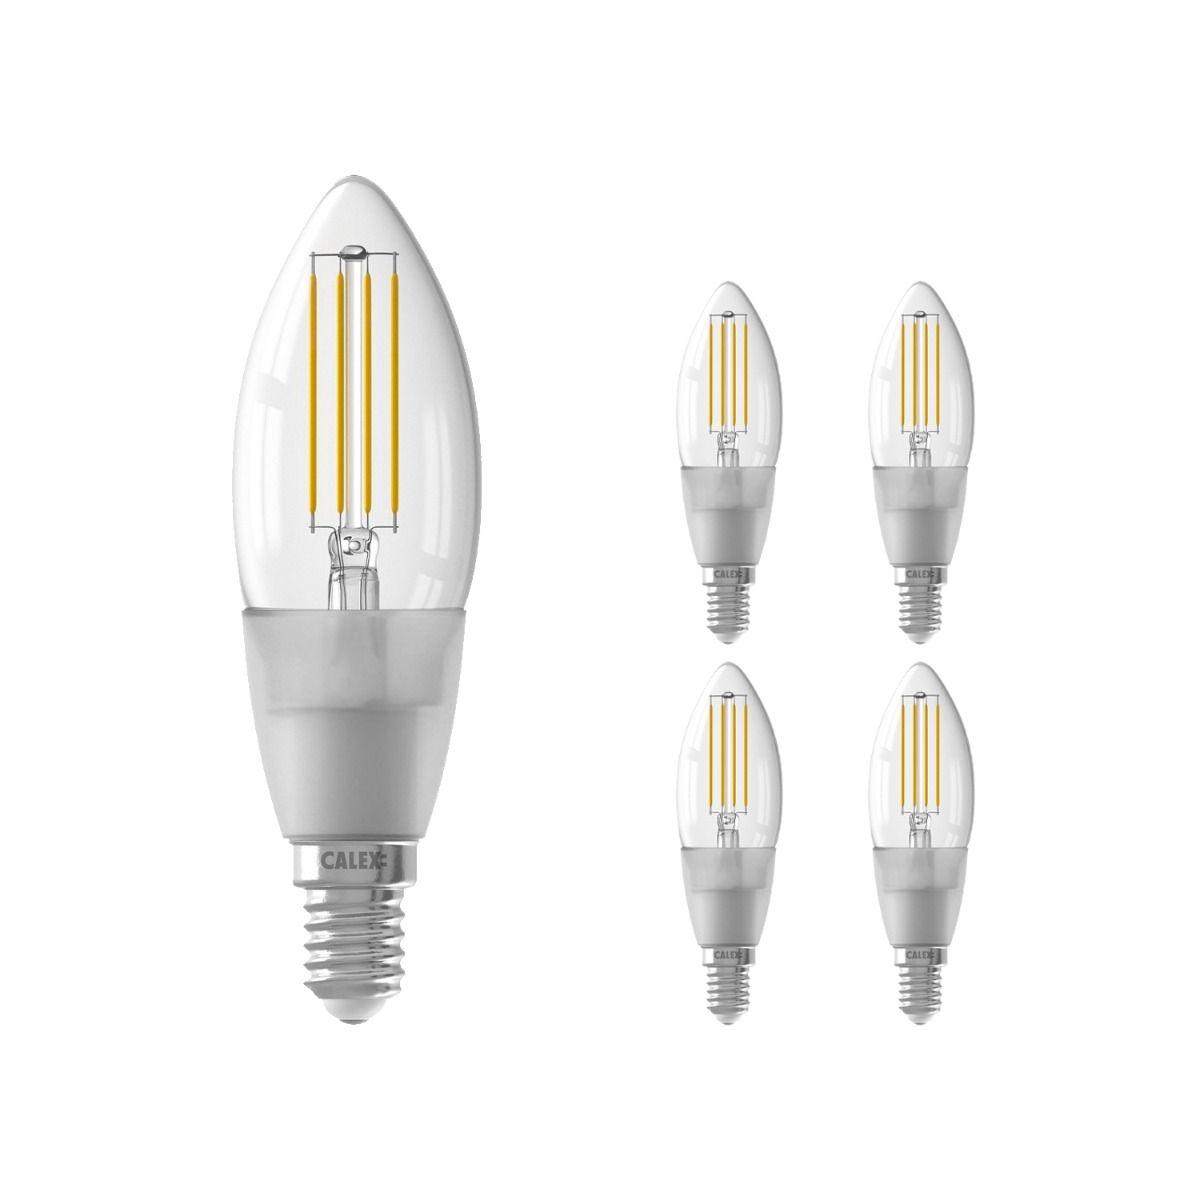 Voordeelpak 5x Calex Smart Kaars LED Lamp E14 4,5W 450lm 1800-3000K Filament   Tuya Wifi - Afstembaar Wit